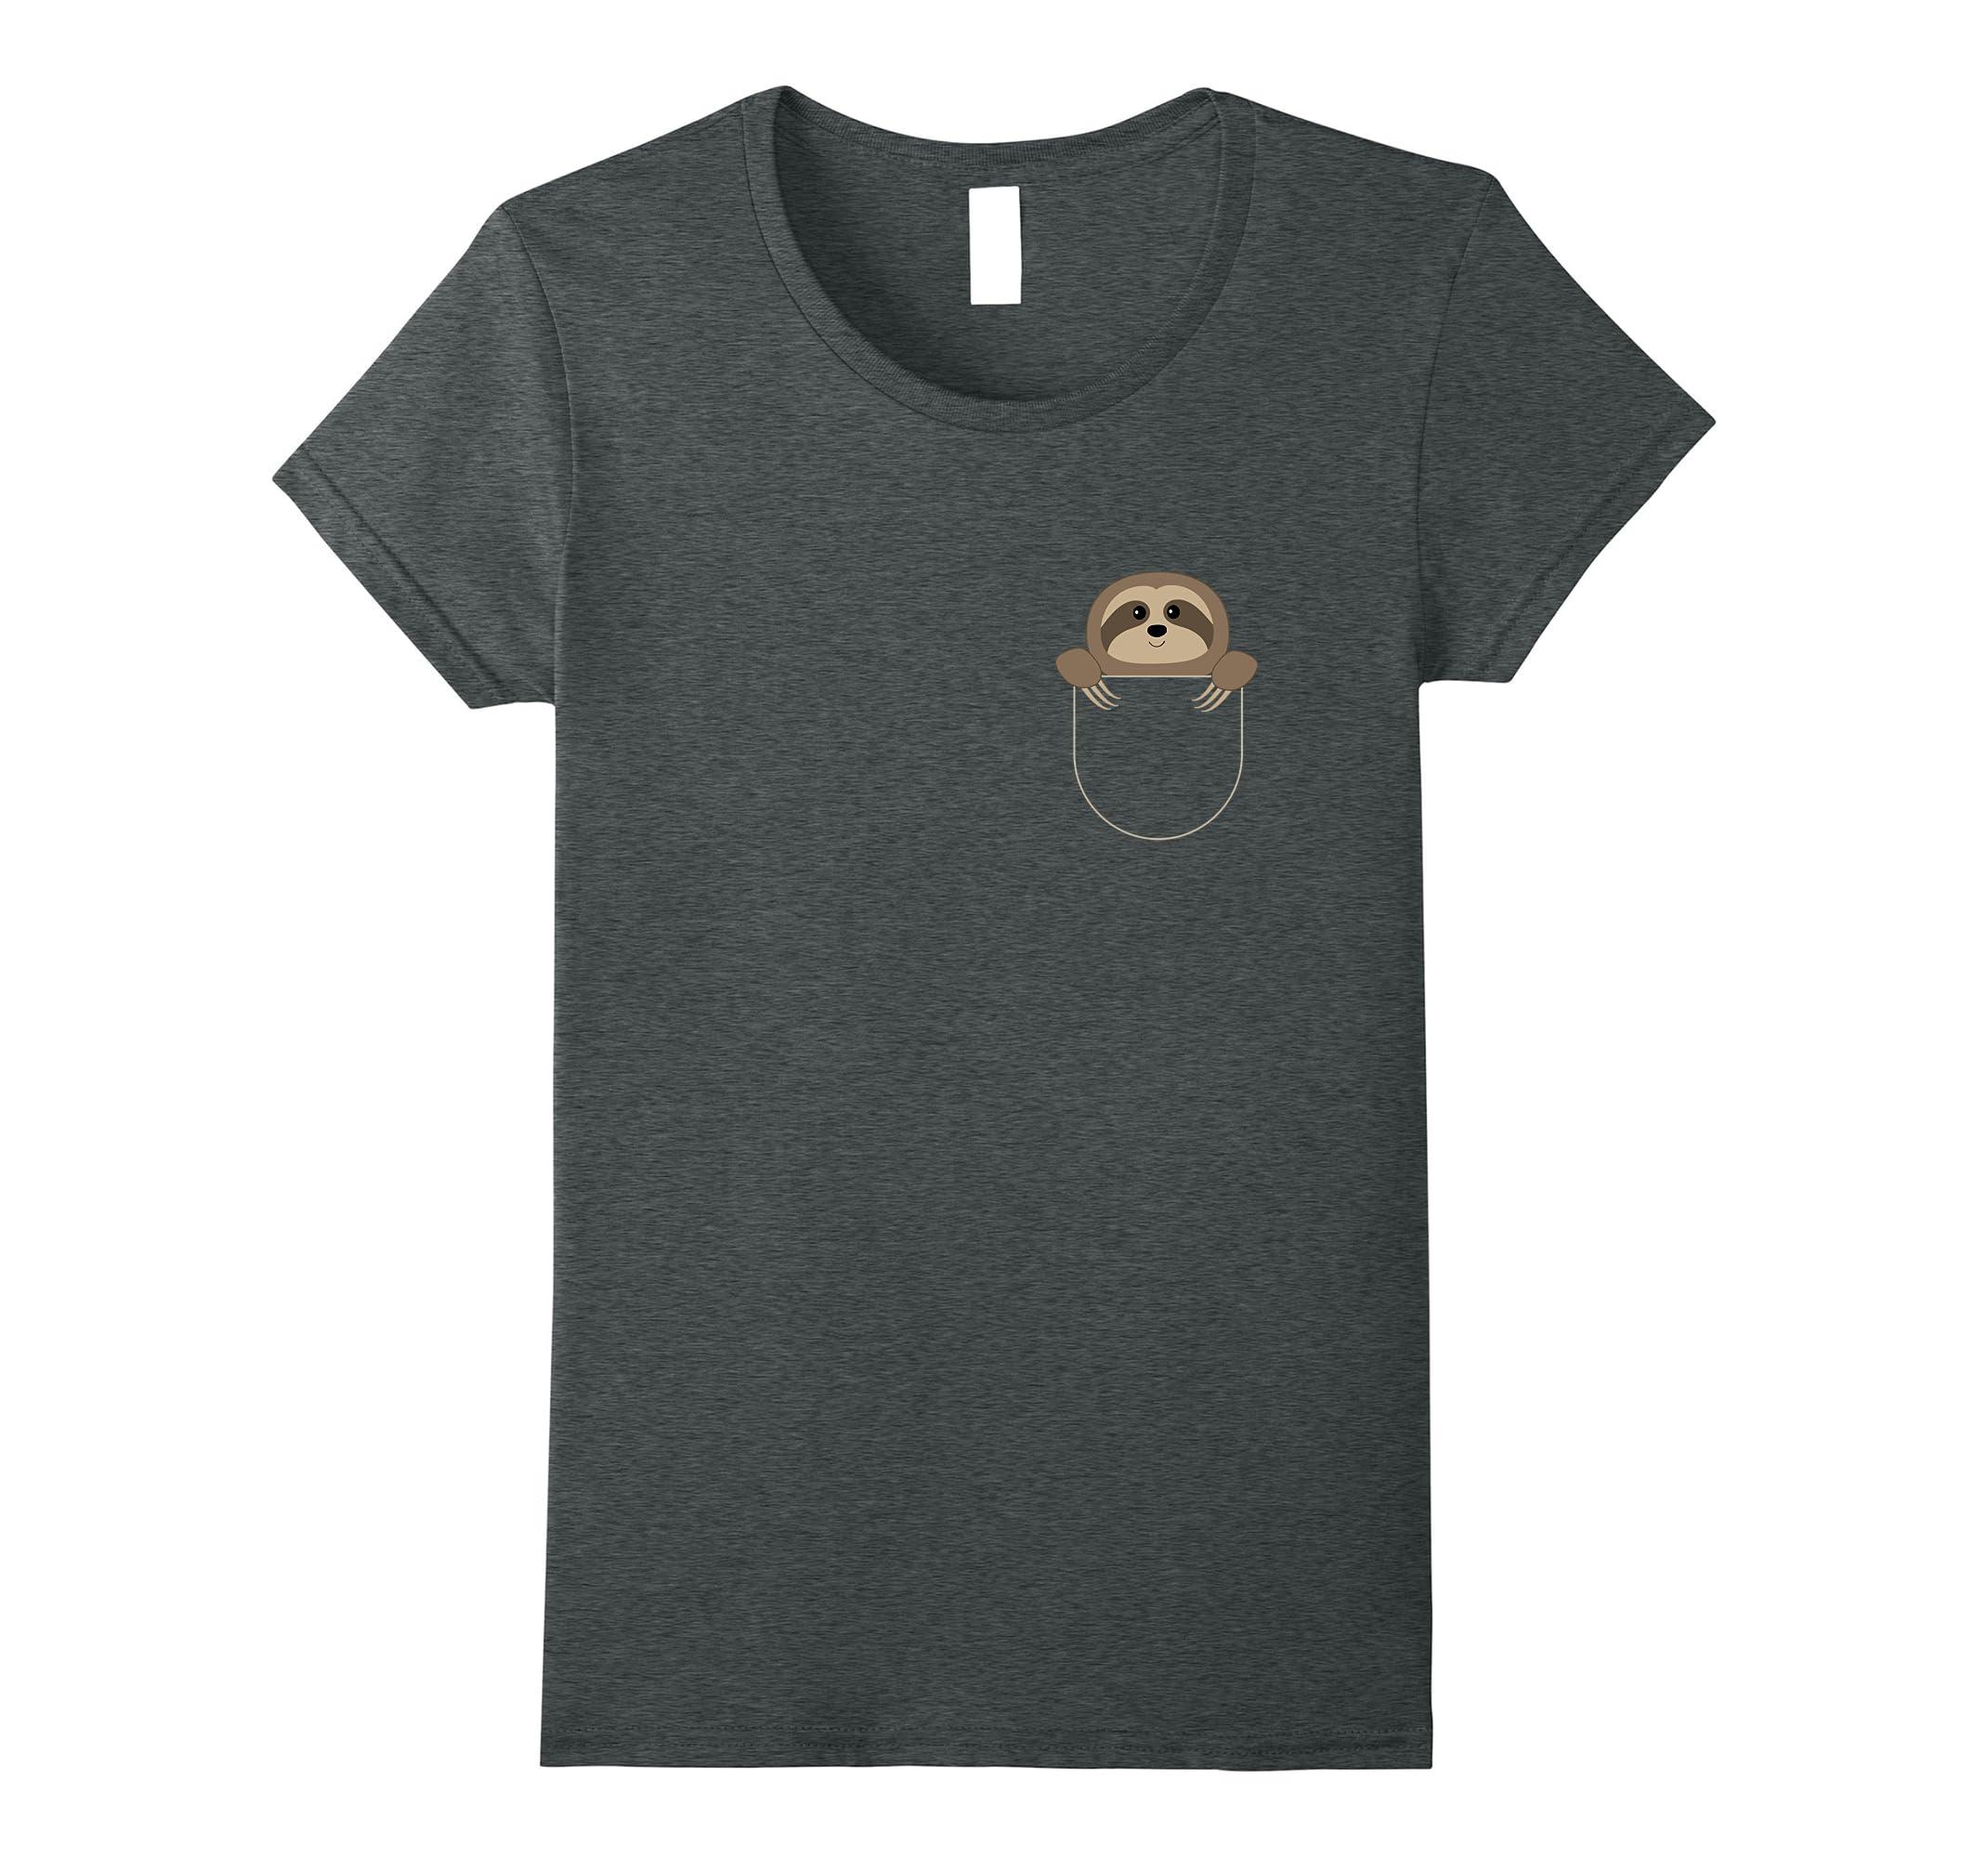 Chillin Sloth Pocket T Shirt Funny-Tovacu